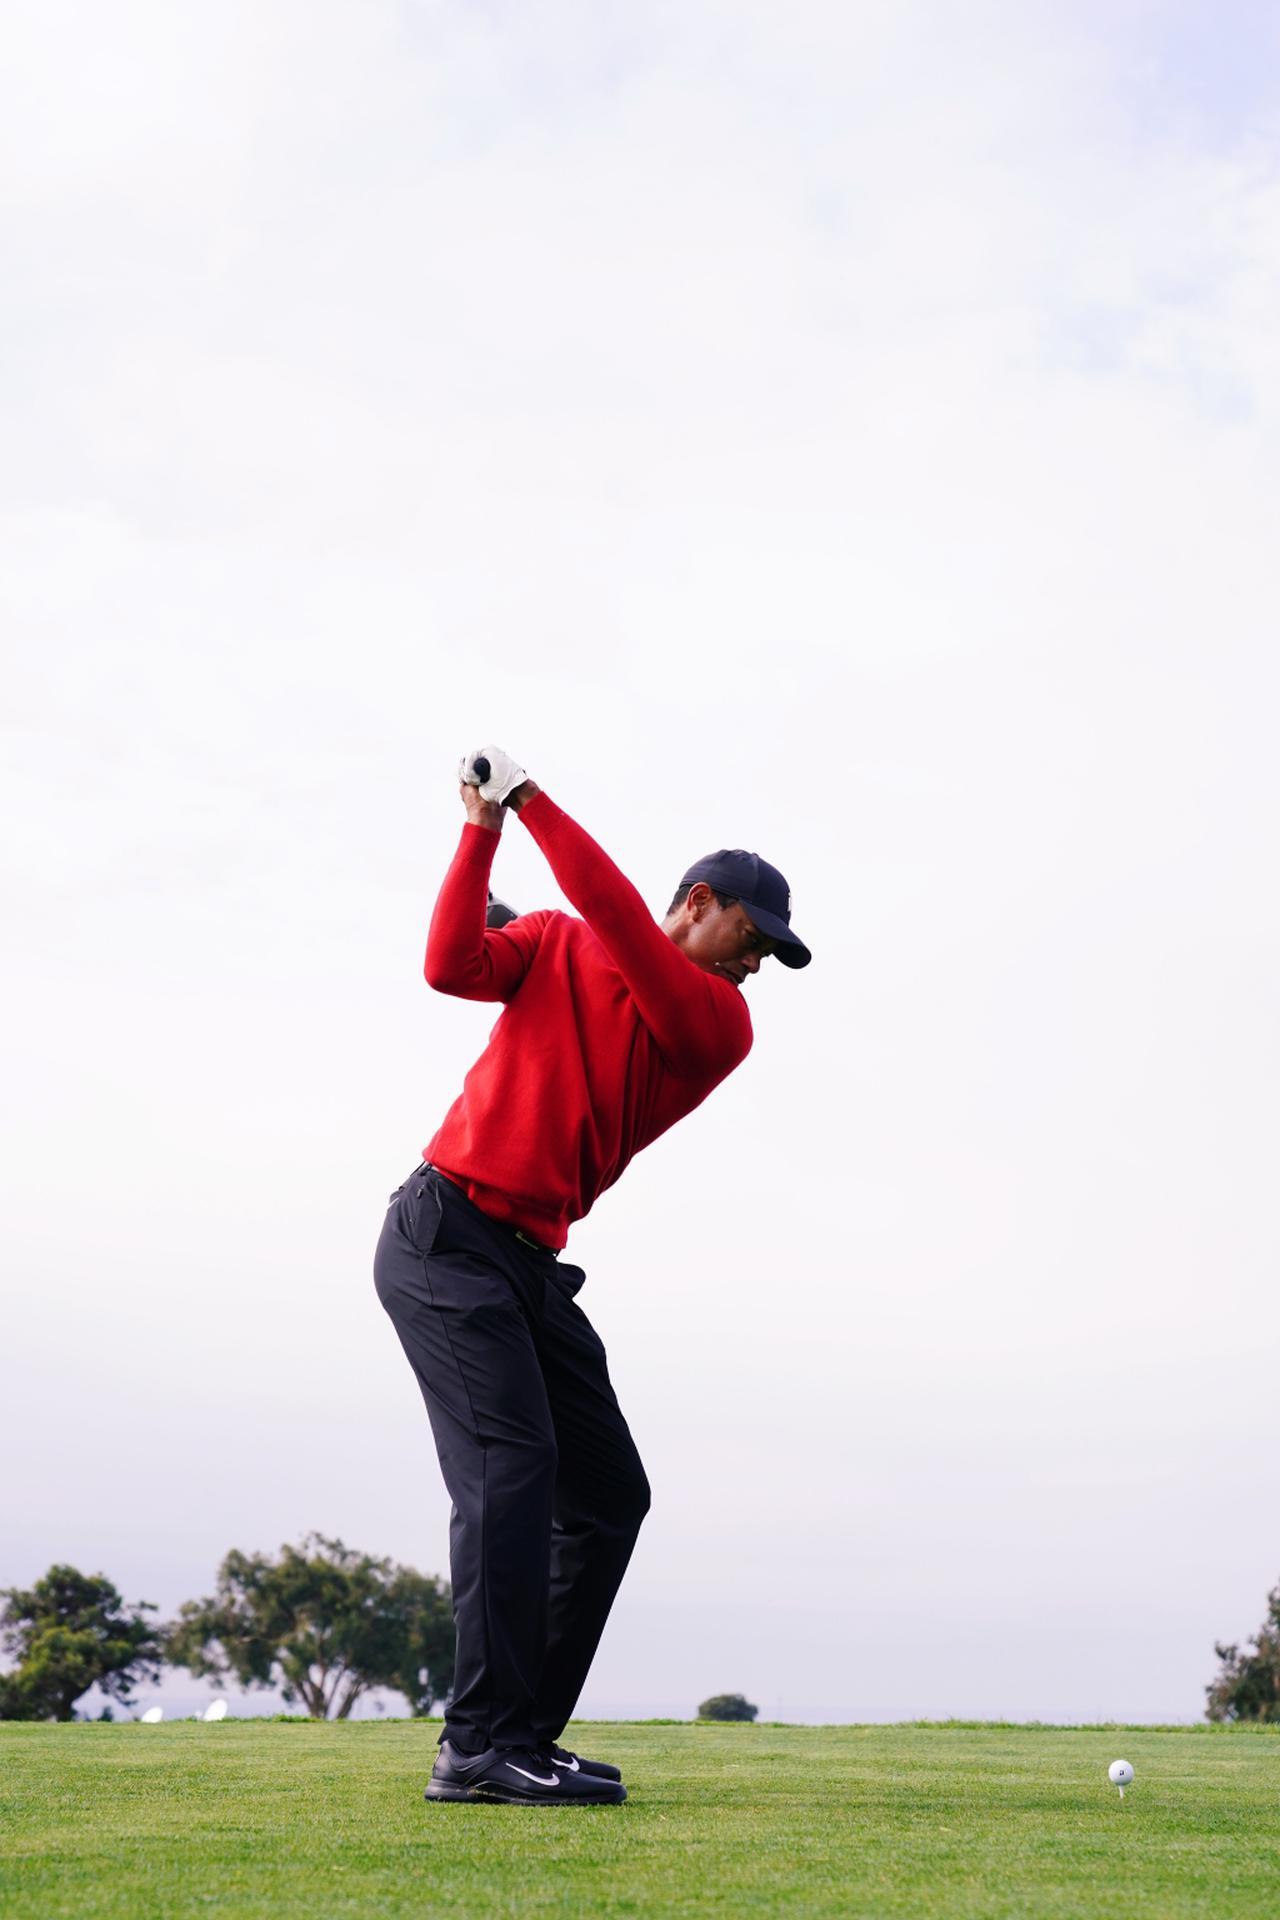 Images : 4番目の画像 - タイガー・ウッズのドライバー連続写真 - みんなのゴルフダイジェスト